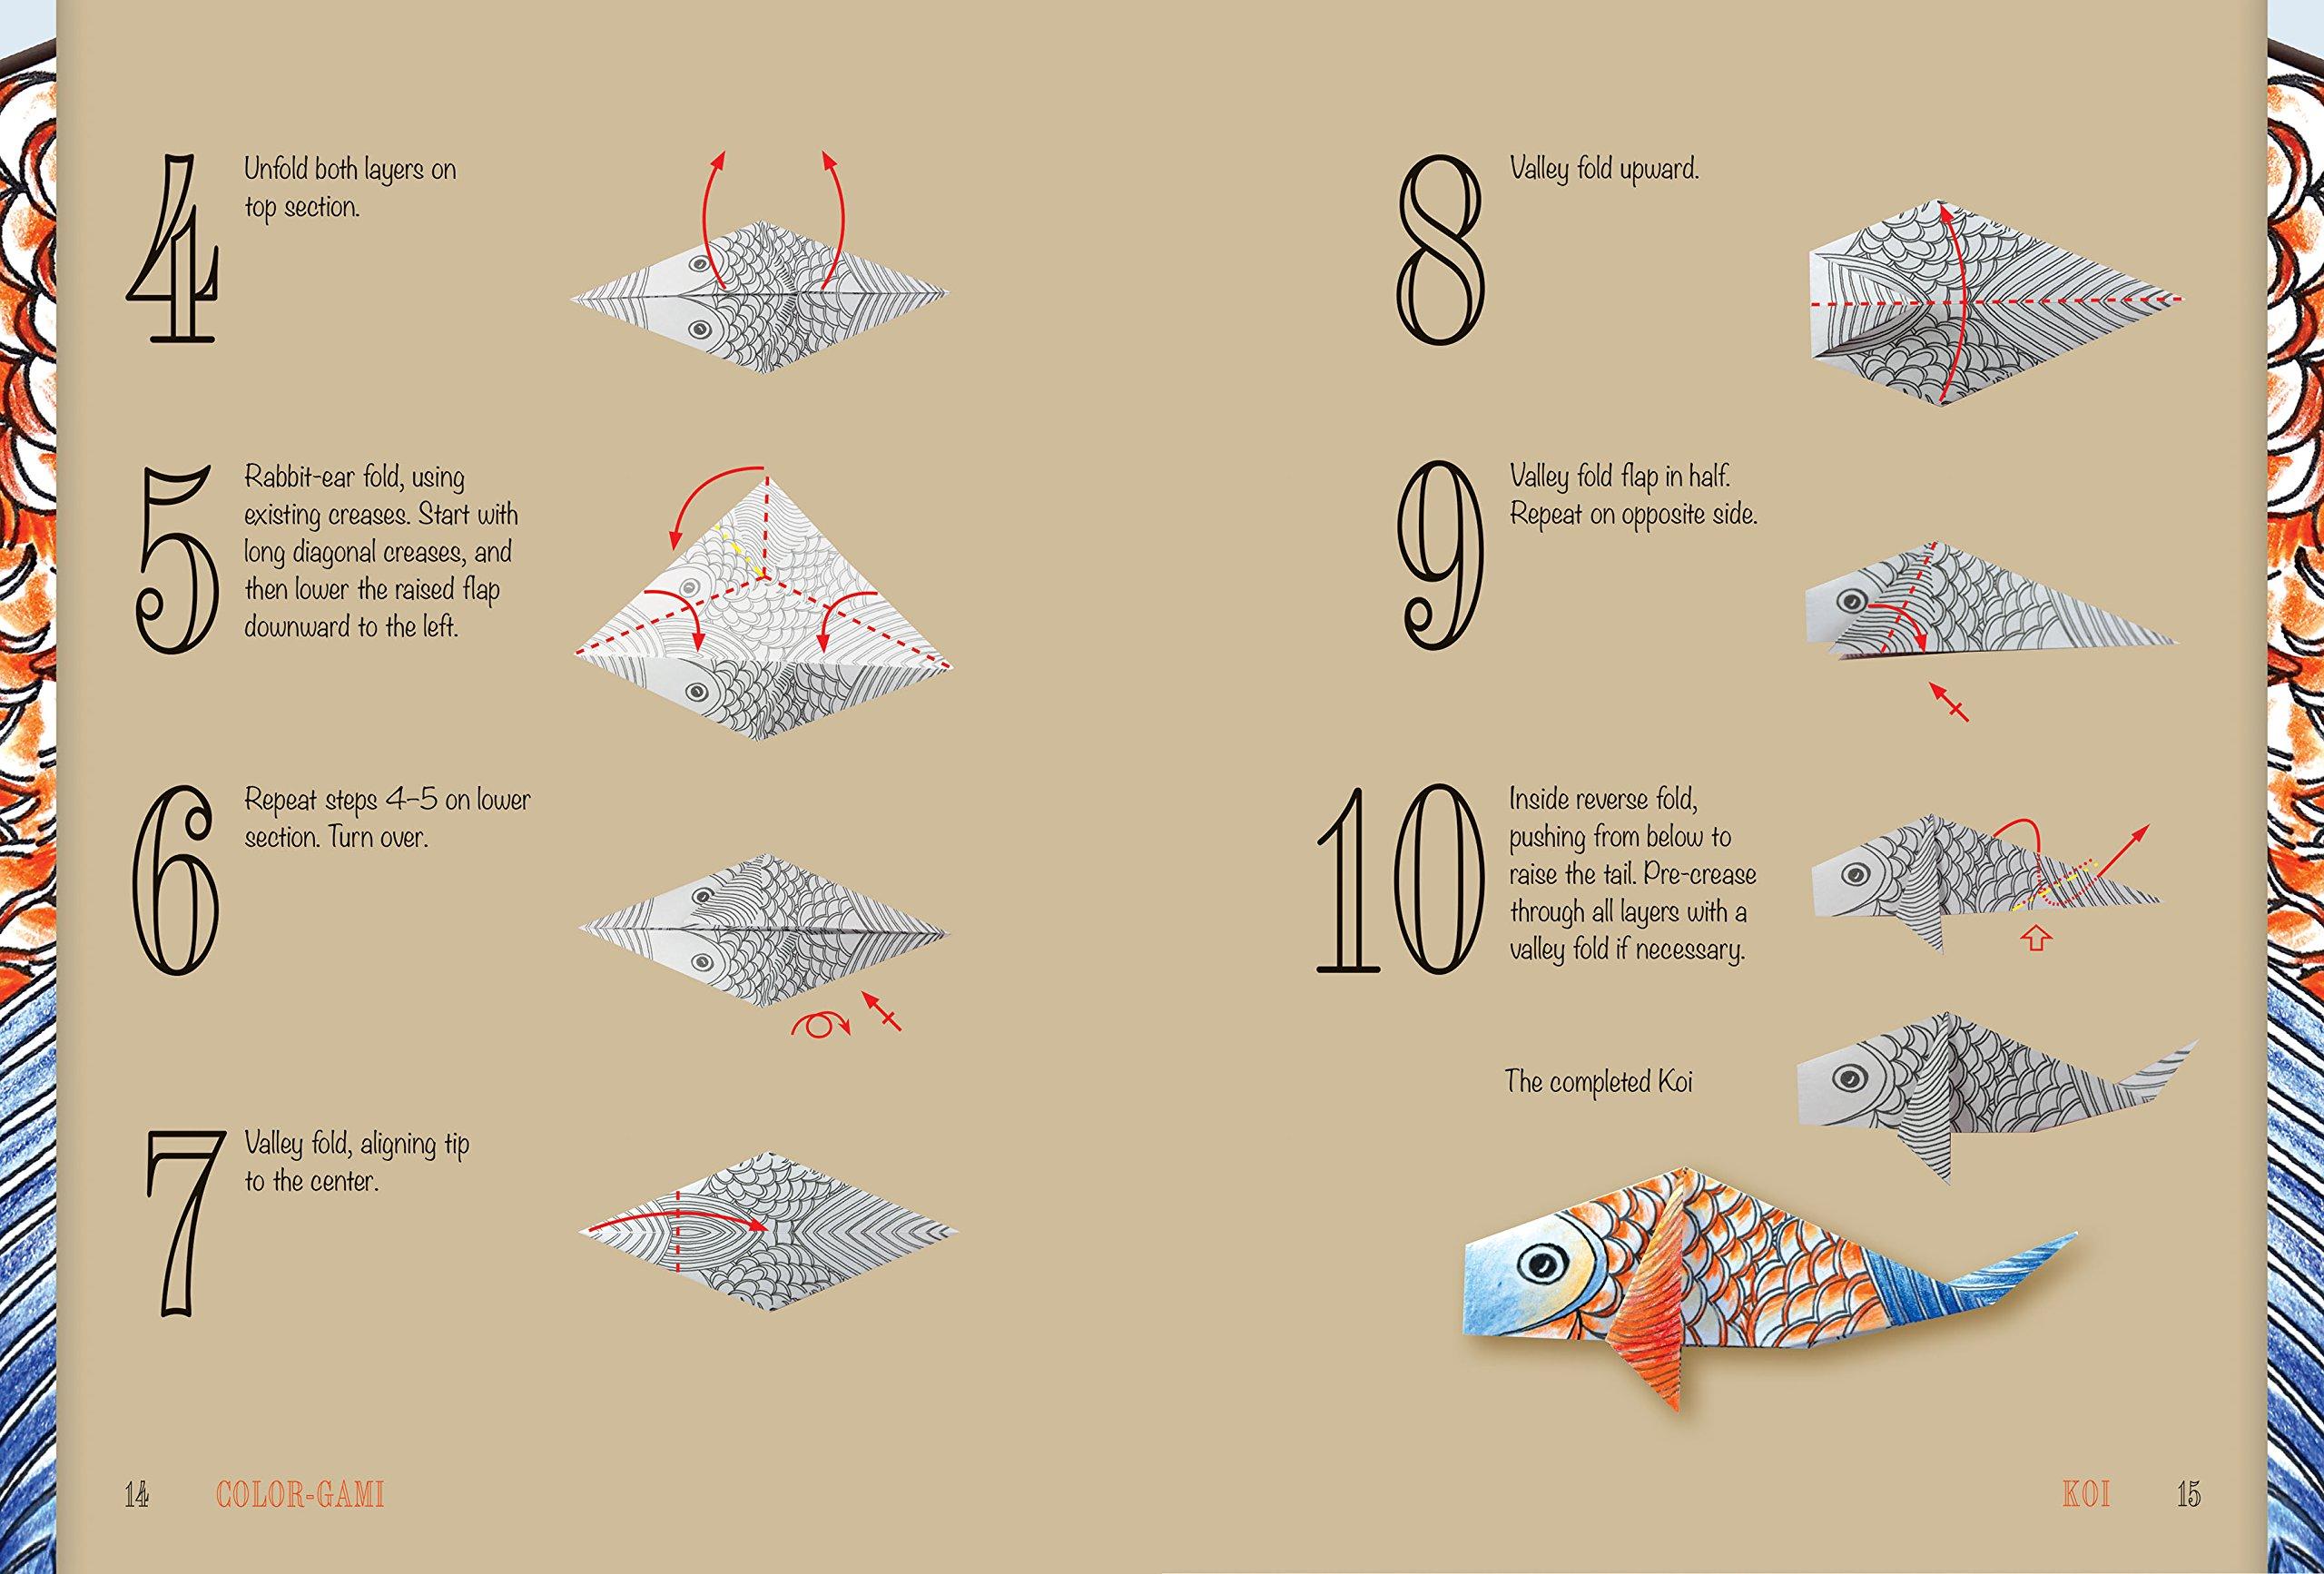 Color Gami Mass Market Origami Books Koi Diagram Masao Donahue 9781626868076